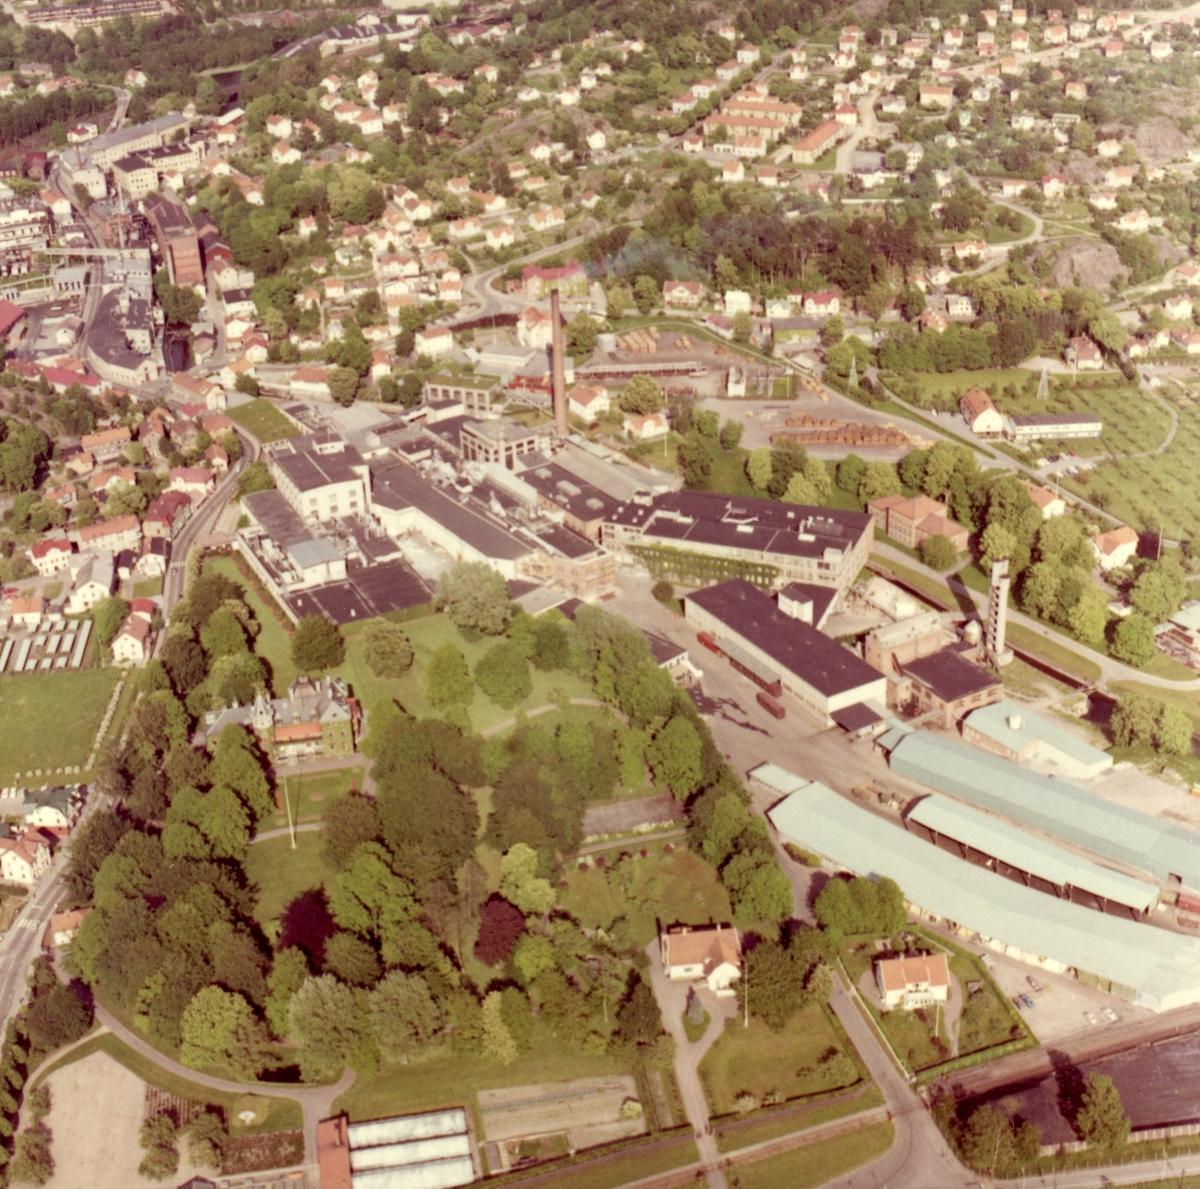 Flygfoto över Papyrus fabriksområde, 9/6-1969.